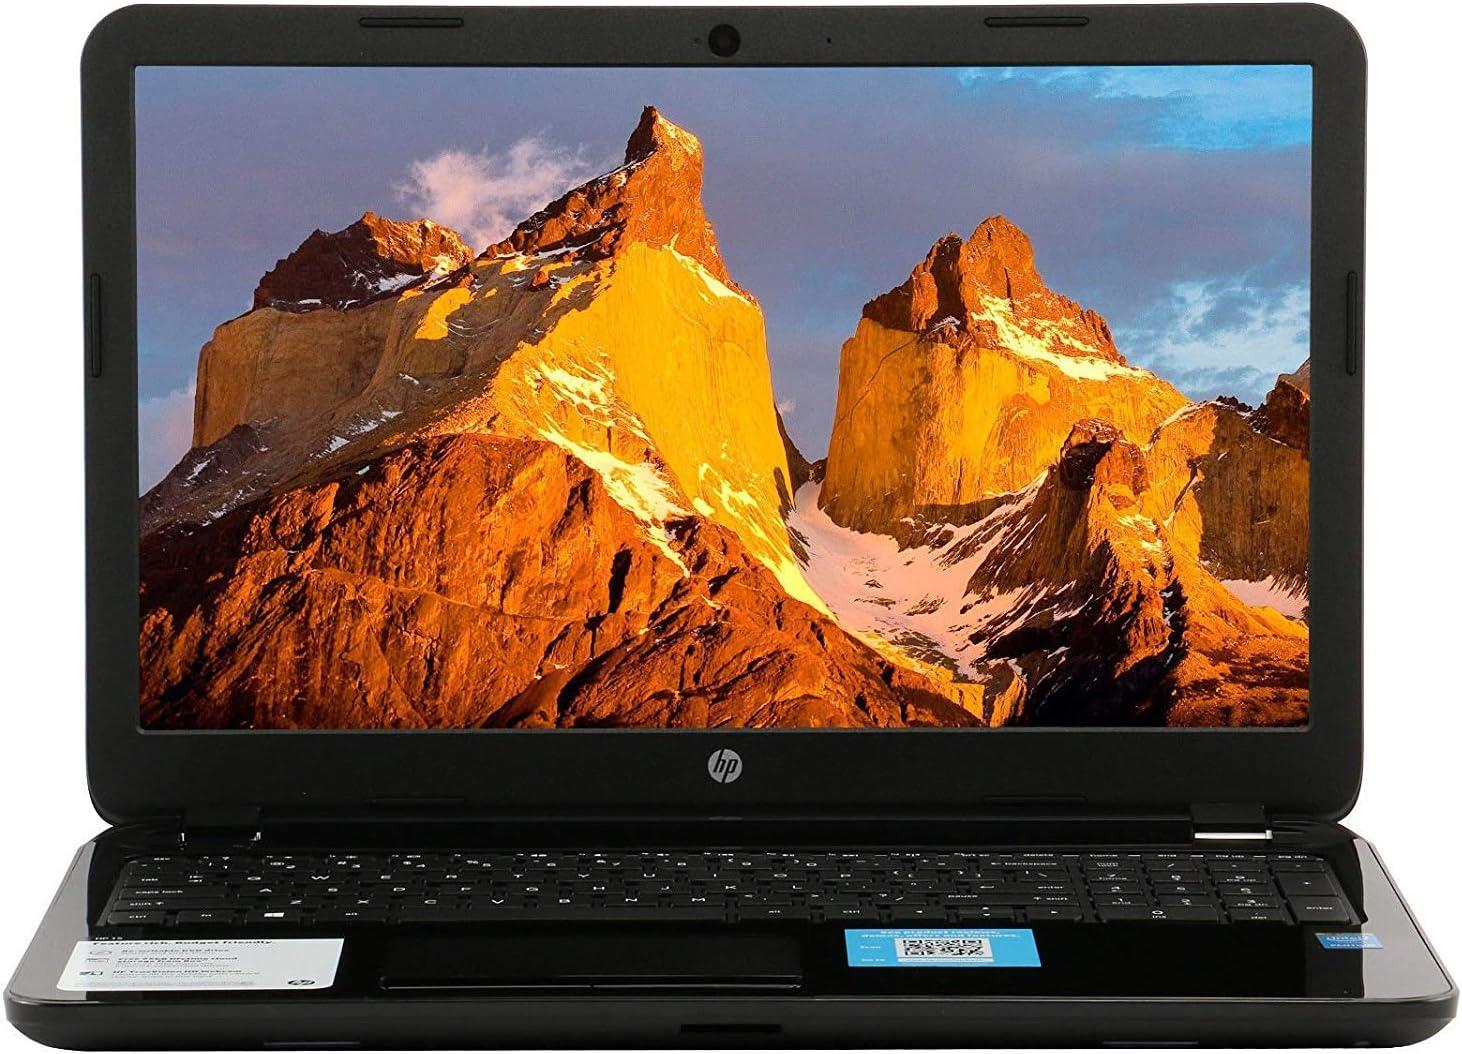 "HP 15-r029wm 15.6"" Laptop Quad-Core Processor @ 2.42GHz Intel 4GB Memory 500GB HD Windows 8.1"